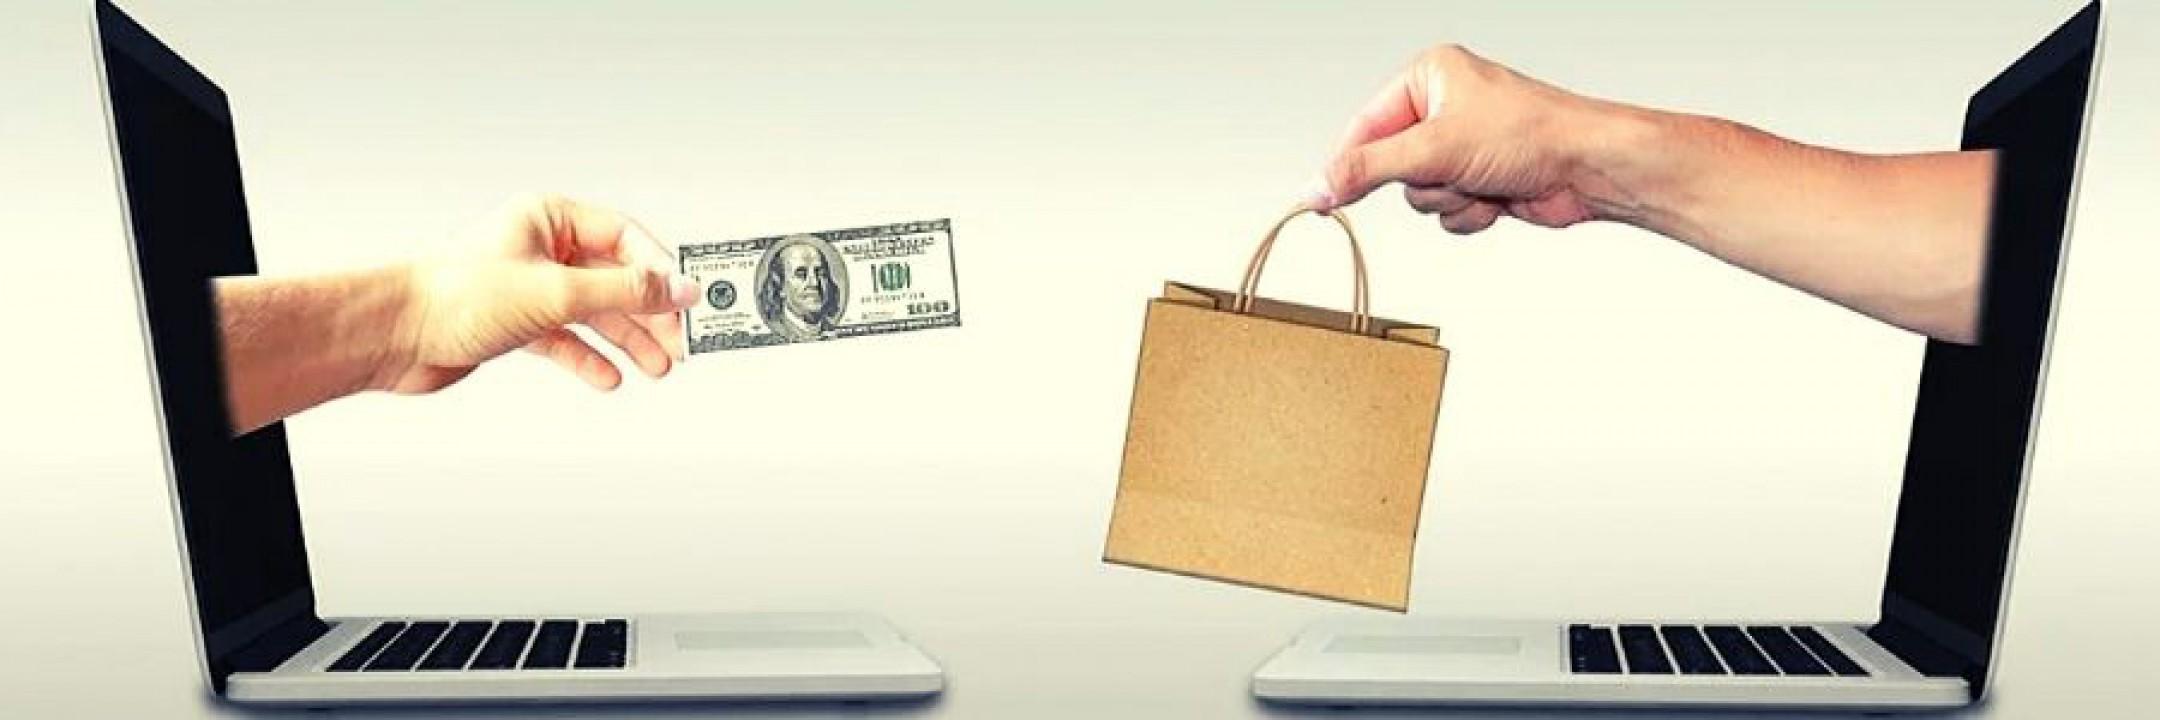 Онлайн-касса для интернет-магазина, Аренда или покупка онлайн кассы для интернет-магазина